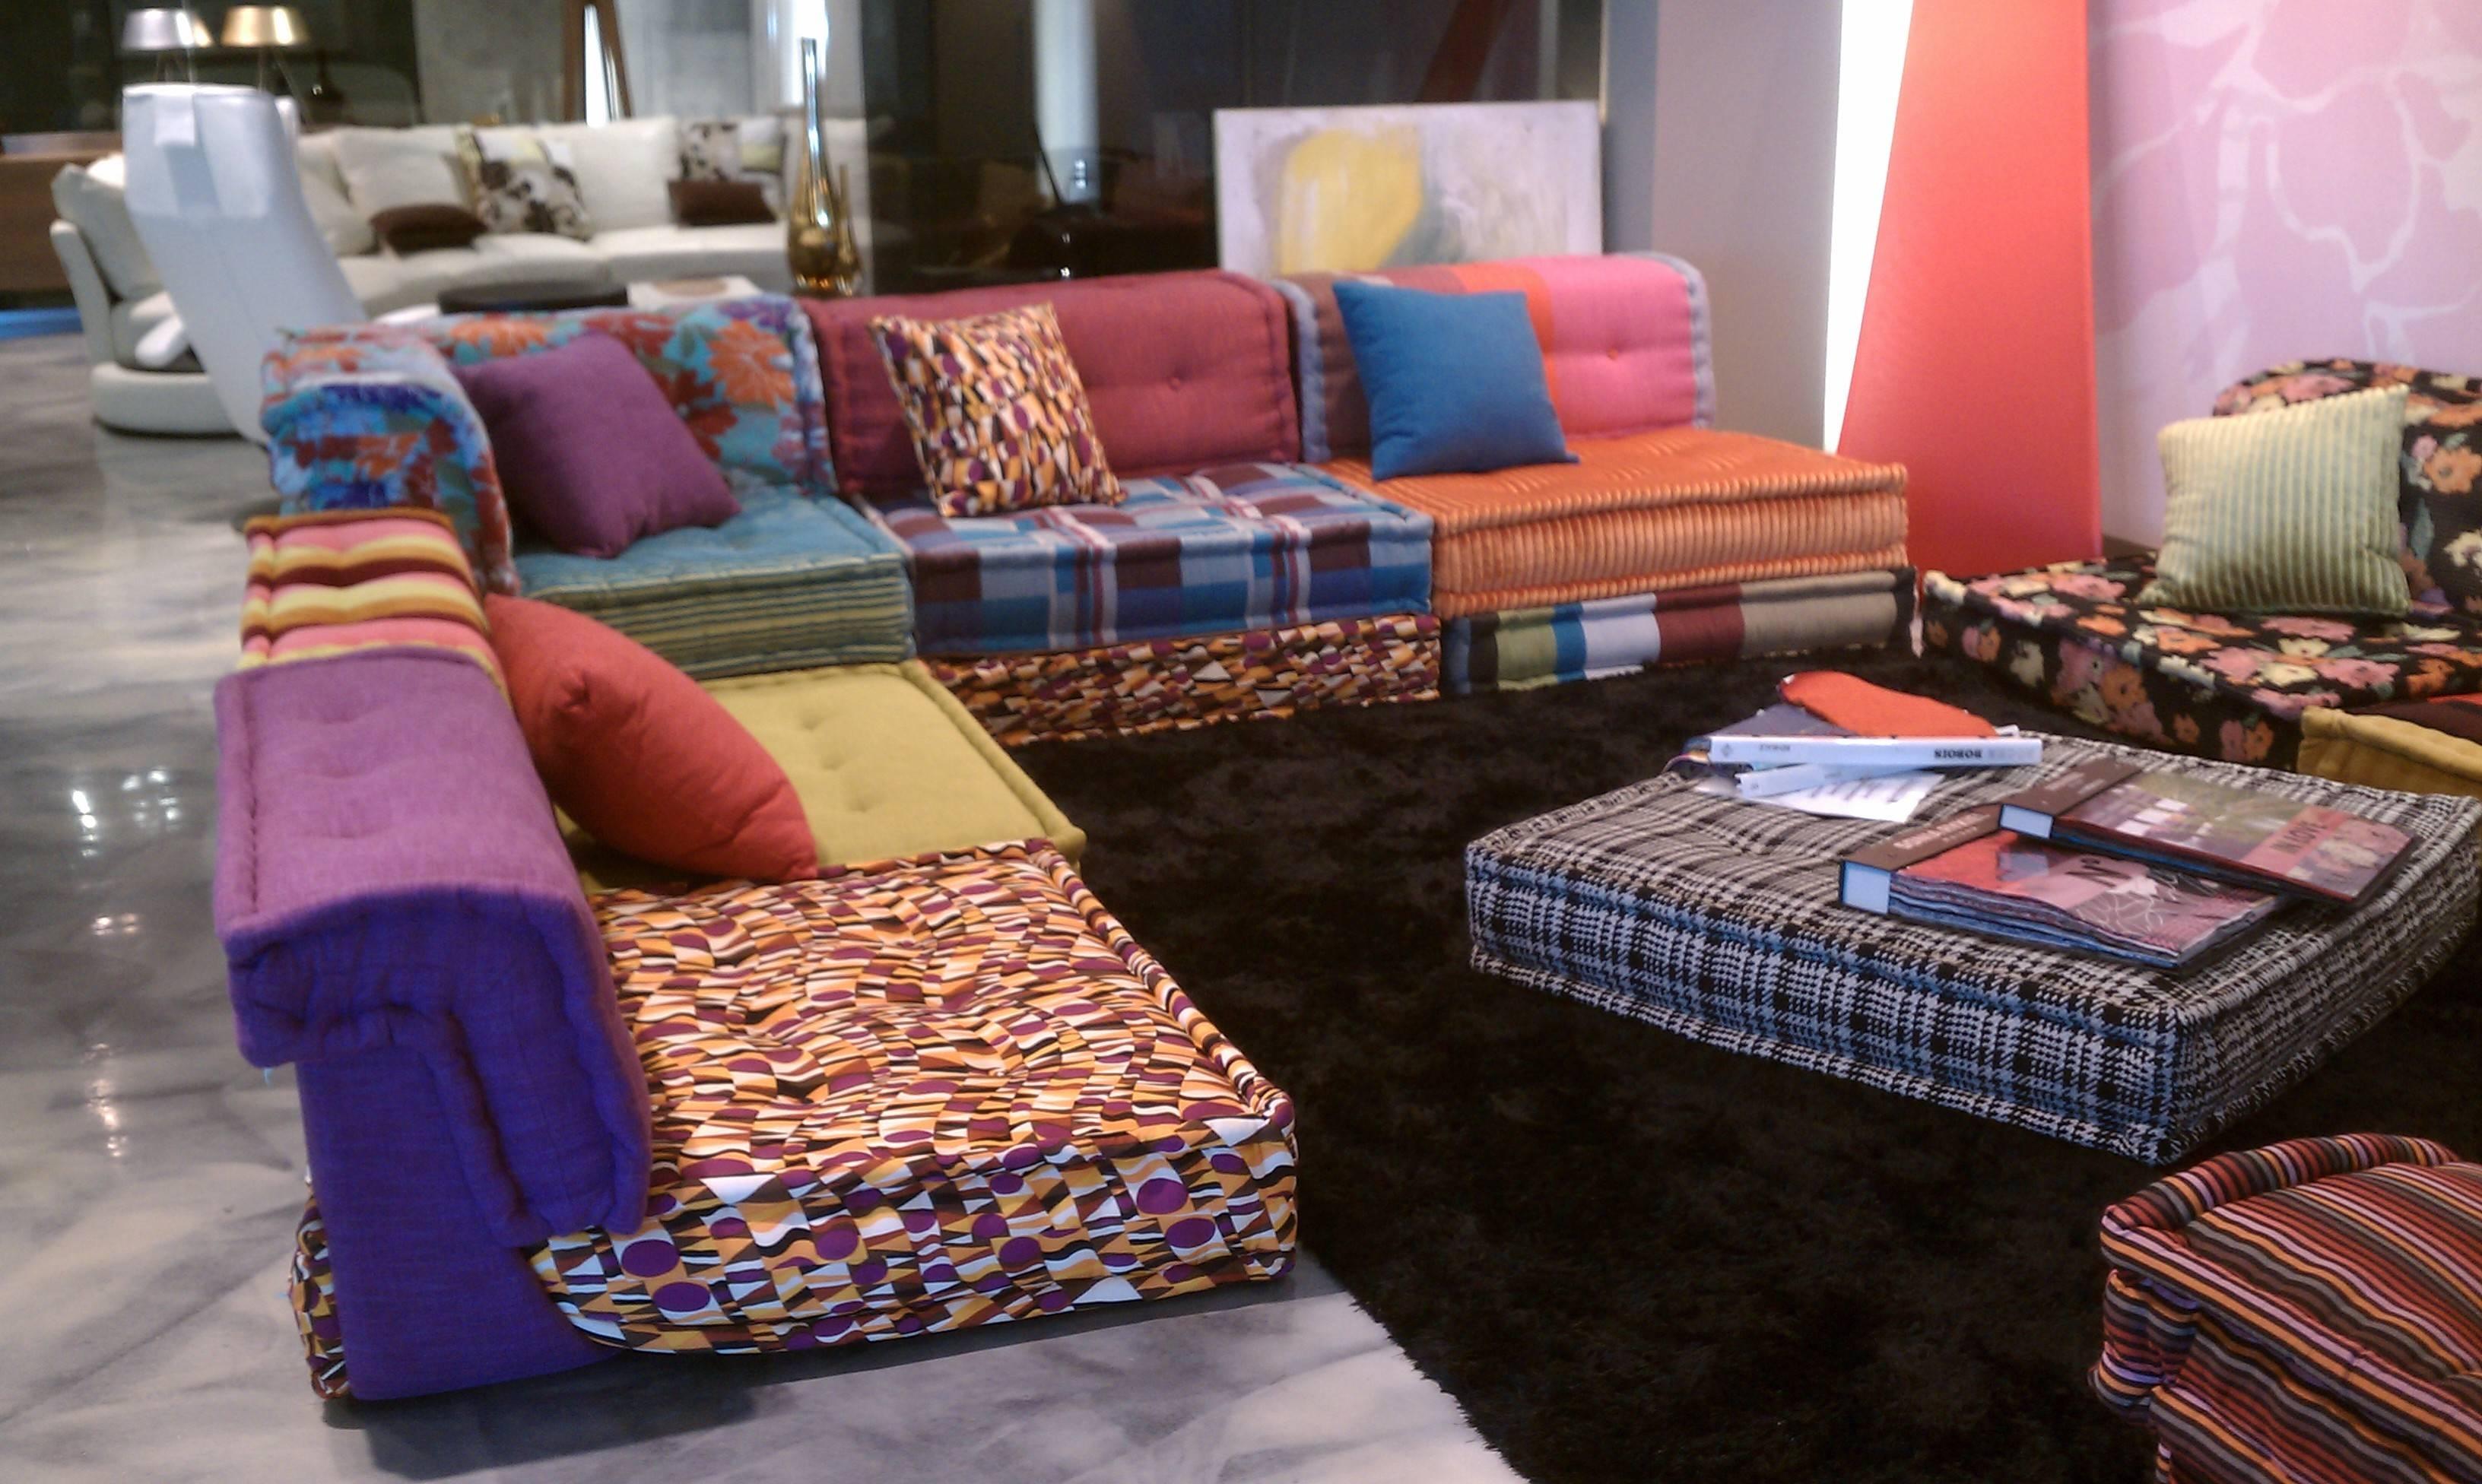 Dream Couch: Missoni Bohemian Sofa | The Cherie Bomb Intended For Roche  Bobois Mah Jong